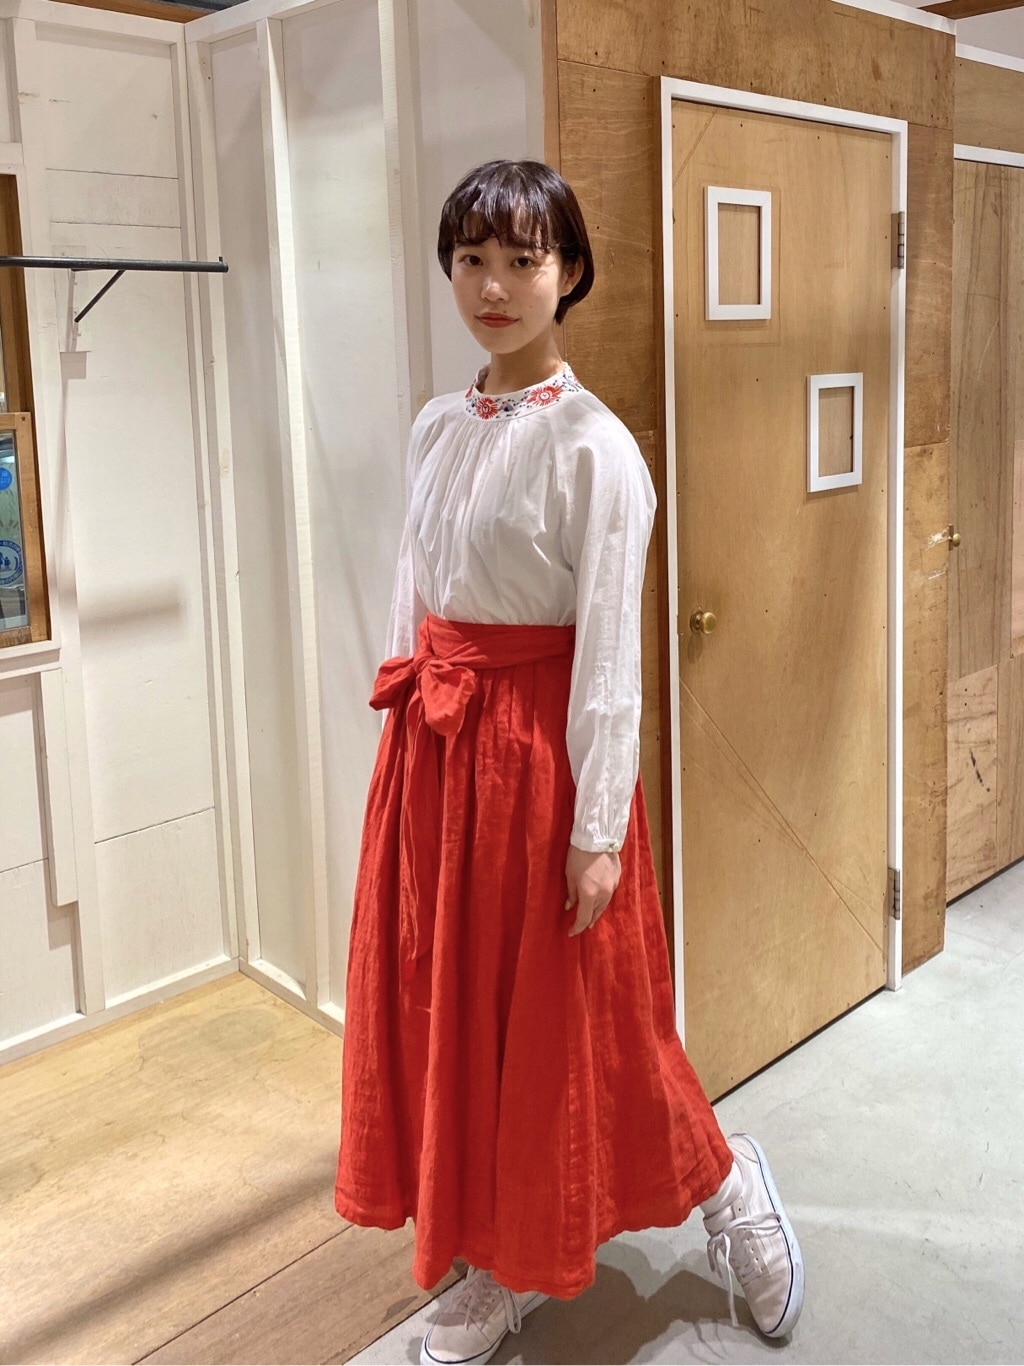 l'atelier du savon 新宿ミロード 身長:159cm 2020.03.29